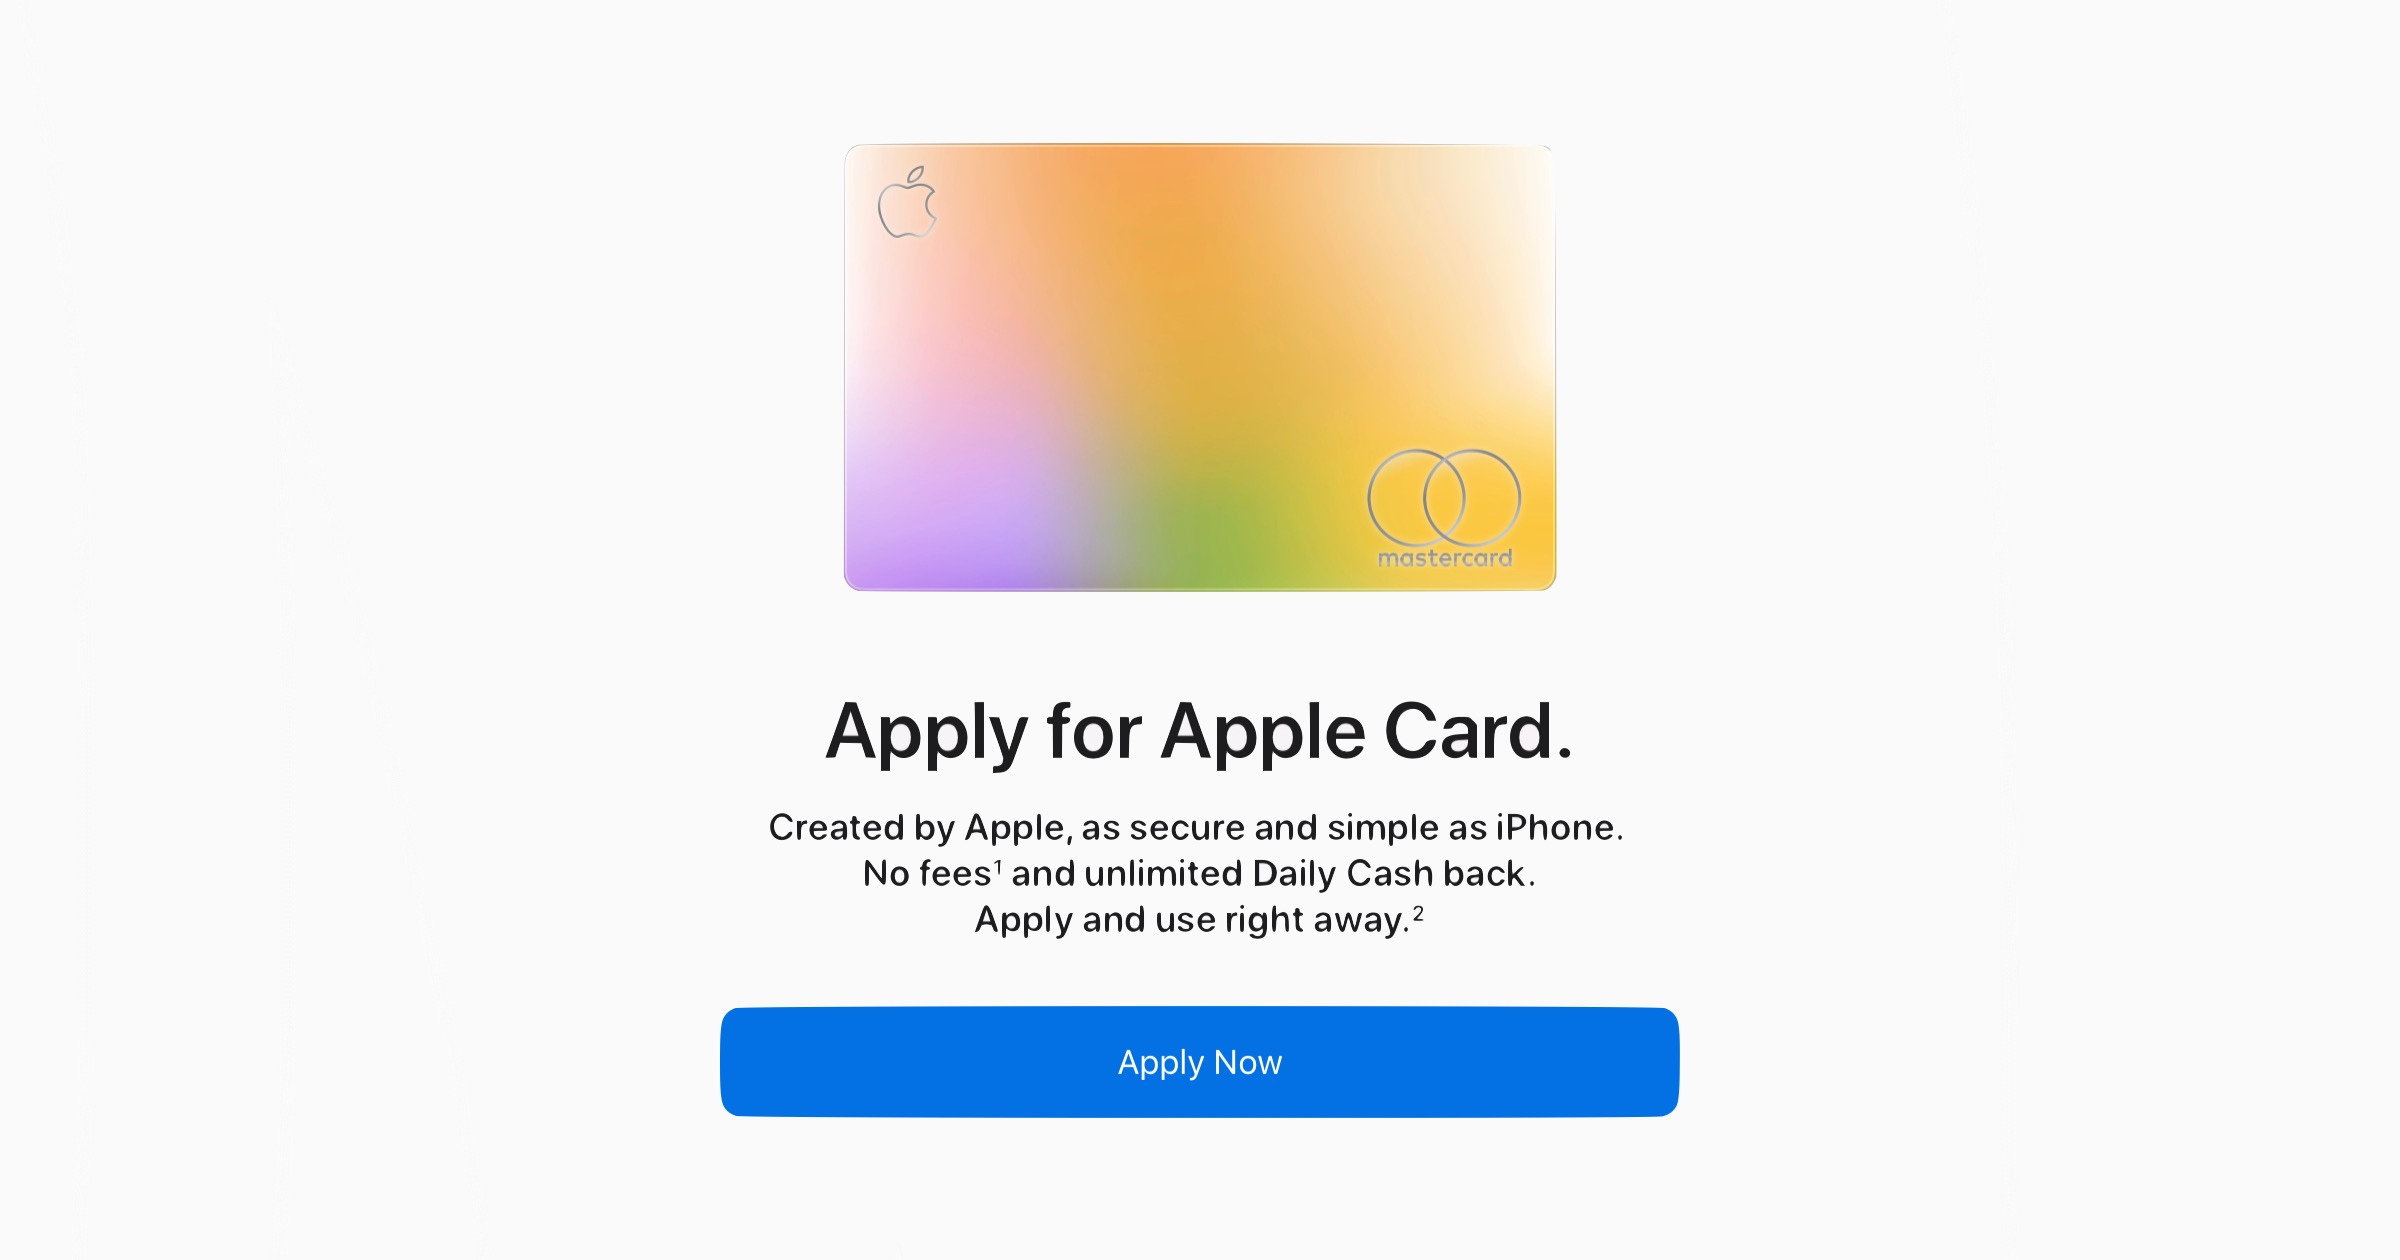 Apply for Apple Card Website